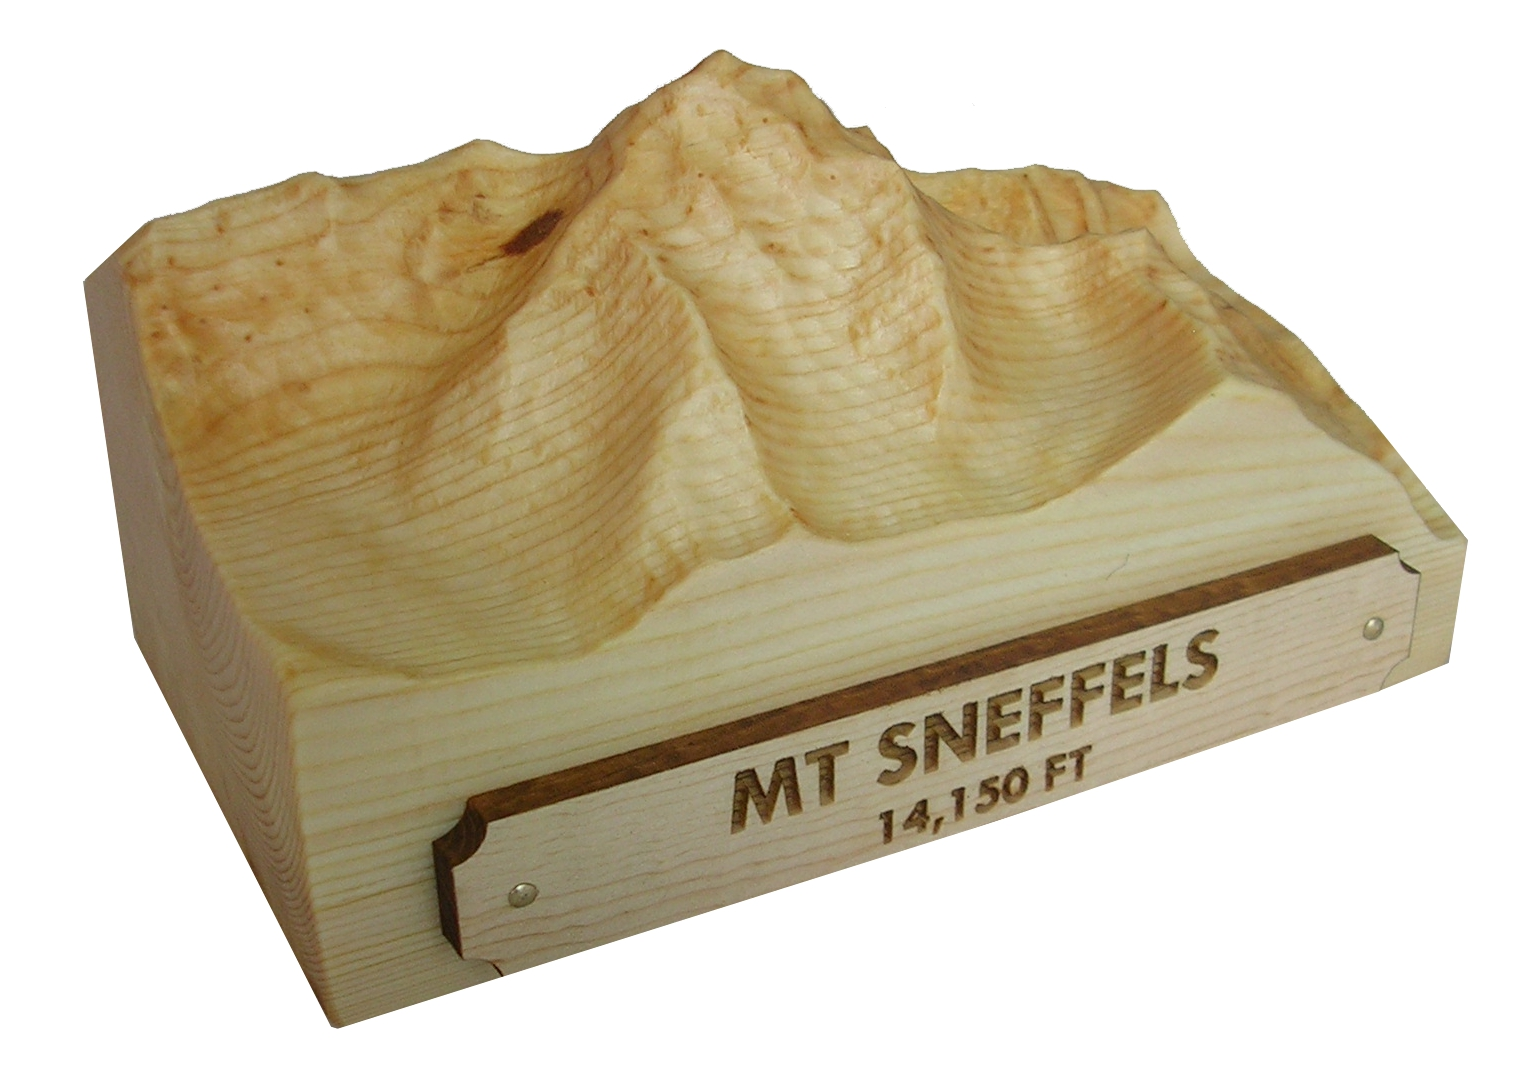 Mount-Sneffels-Carving-Gift.jpg